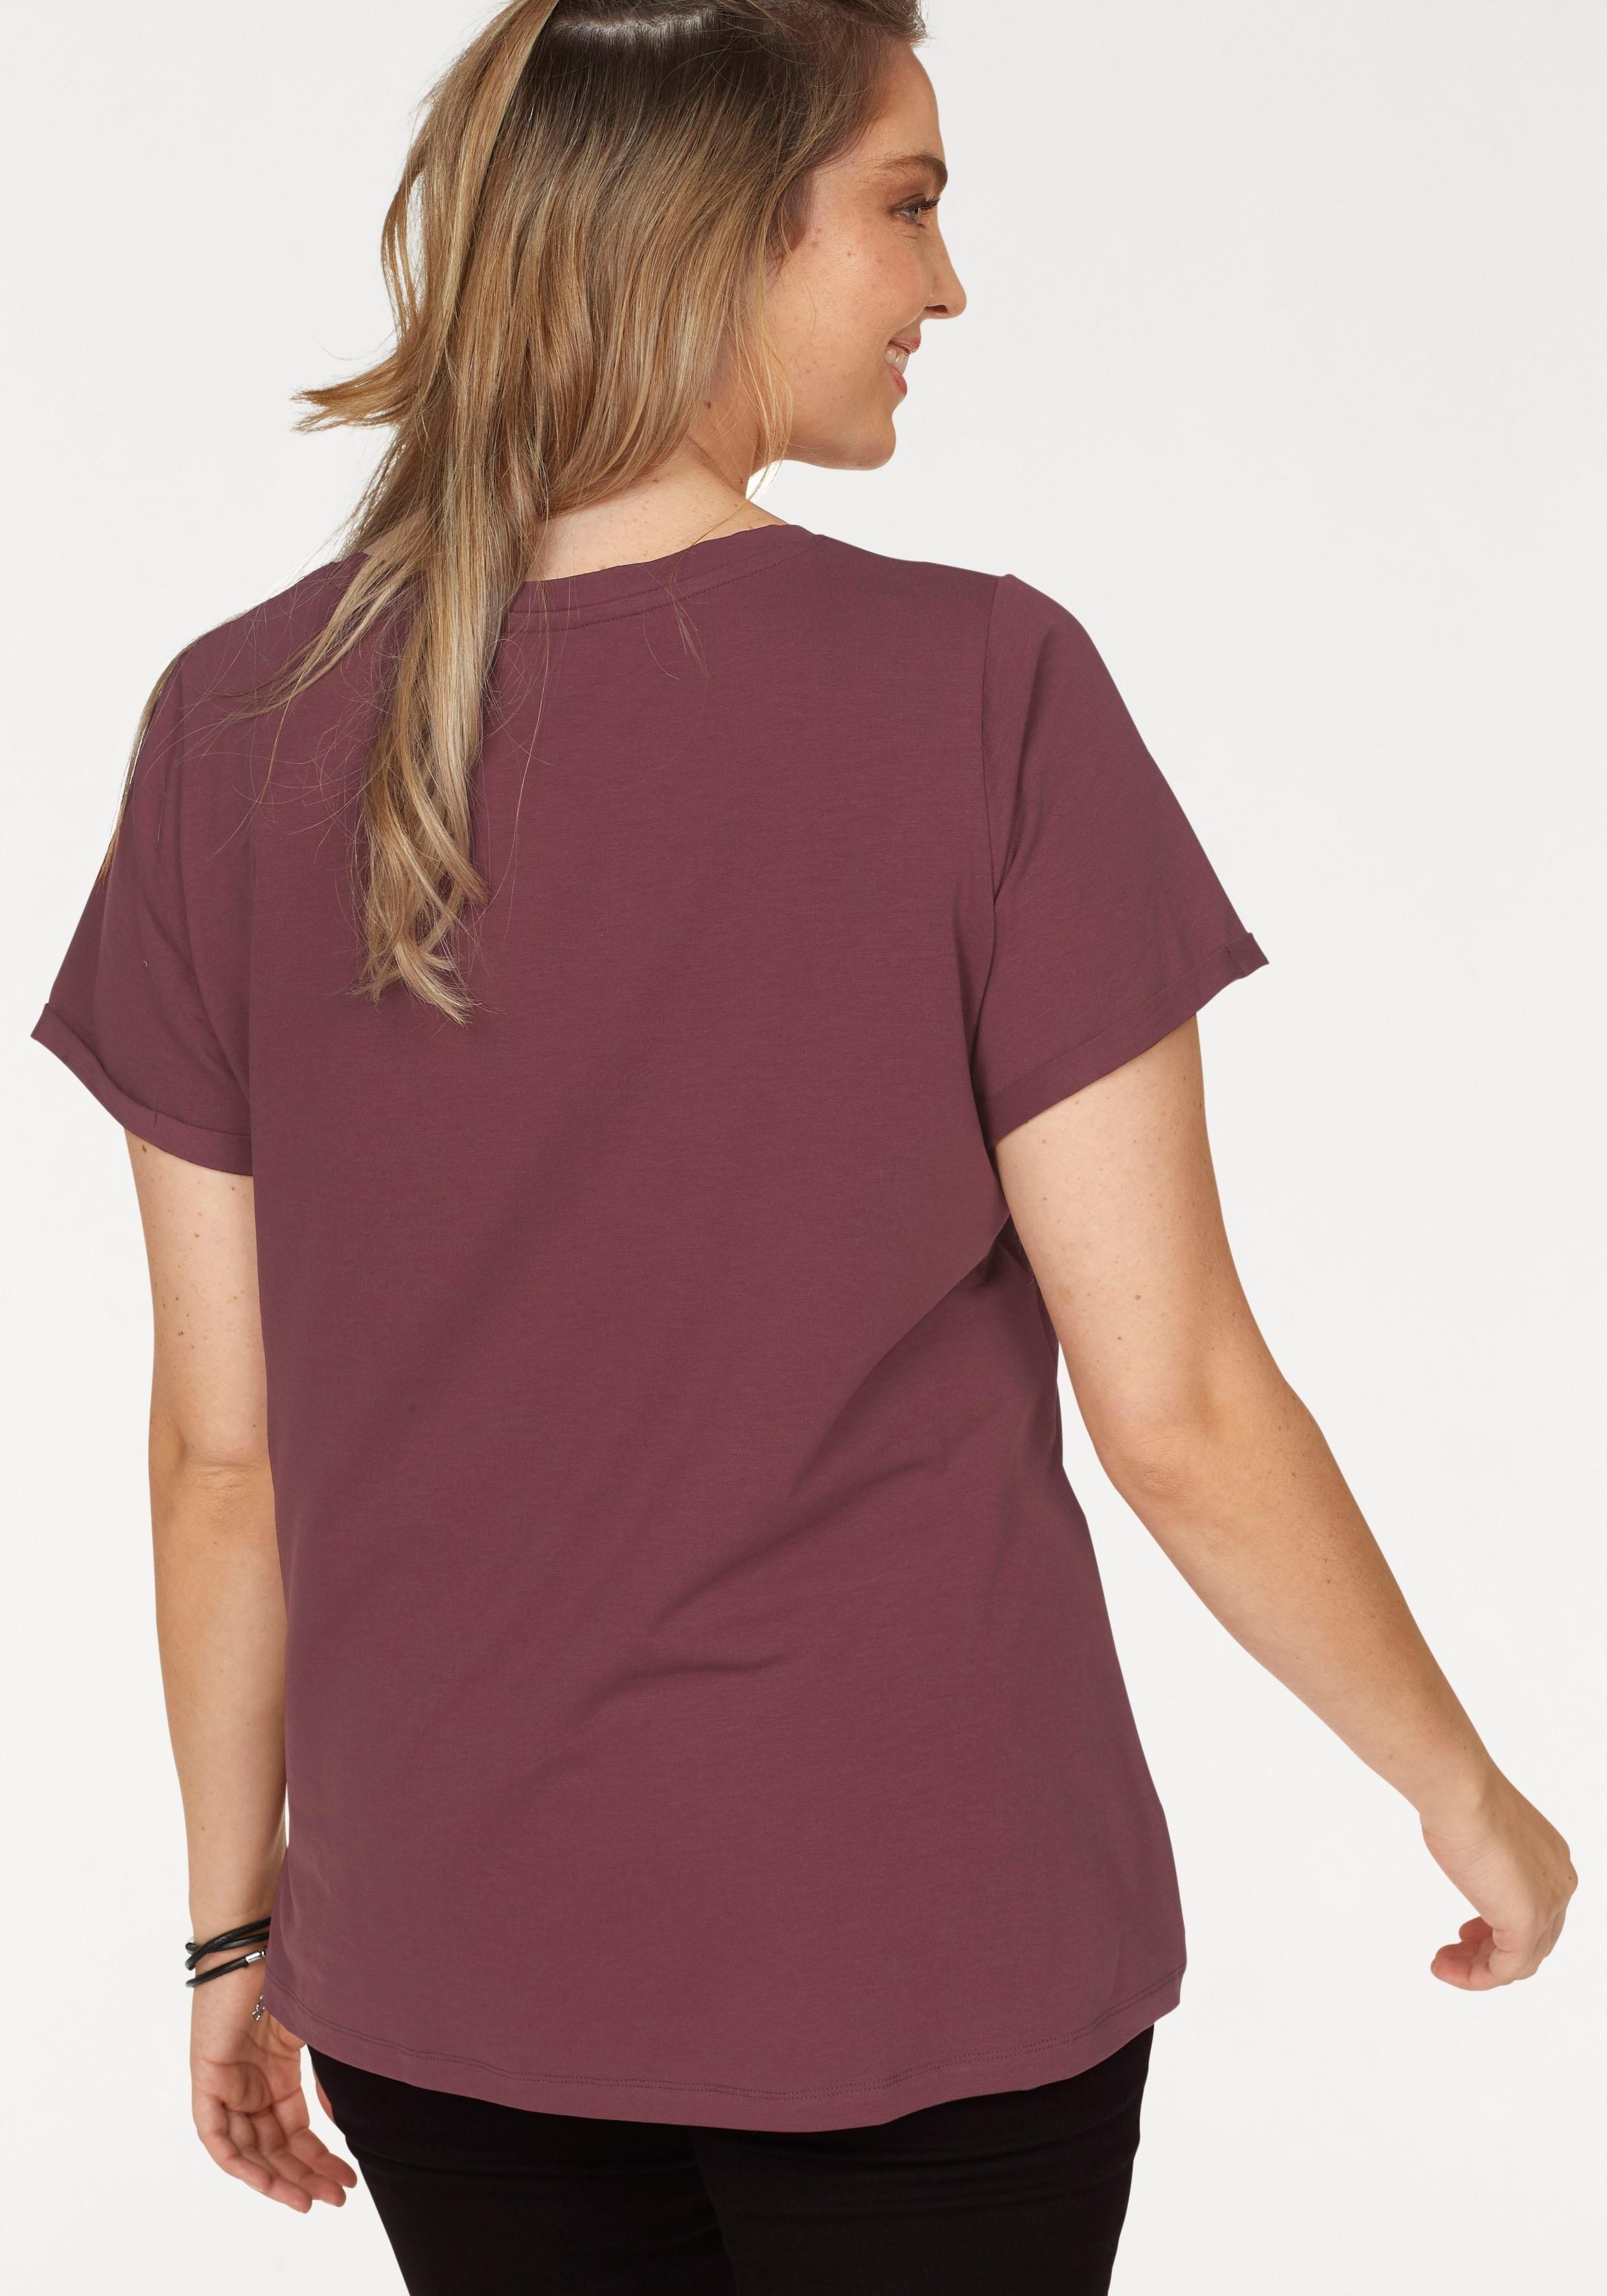 Met Verkrijgbaar Junarose Shirt Online Print UzMSpV